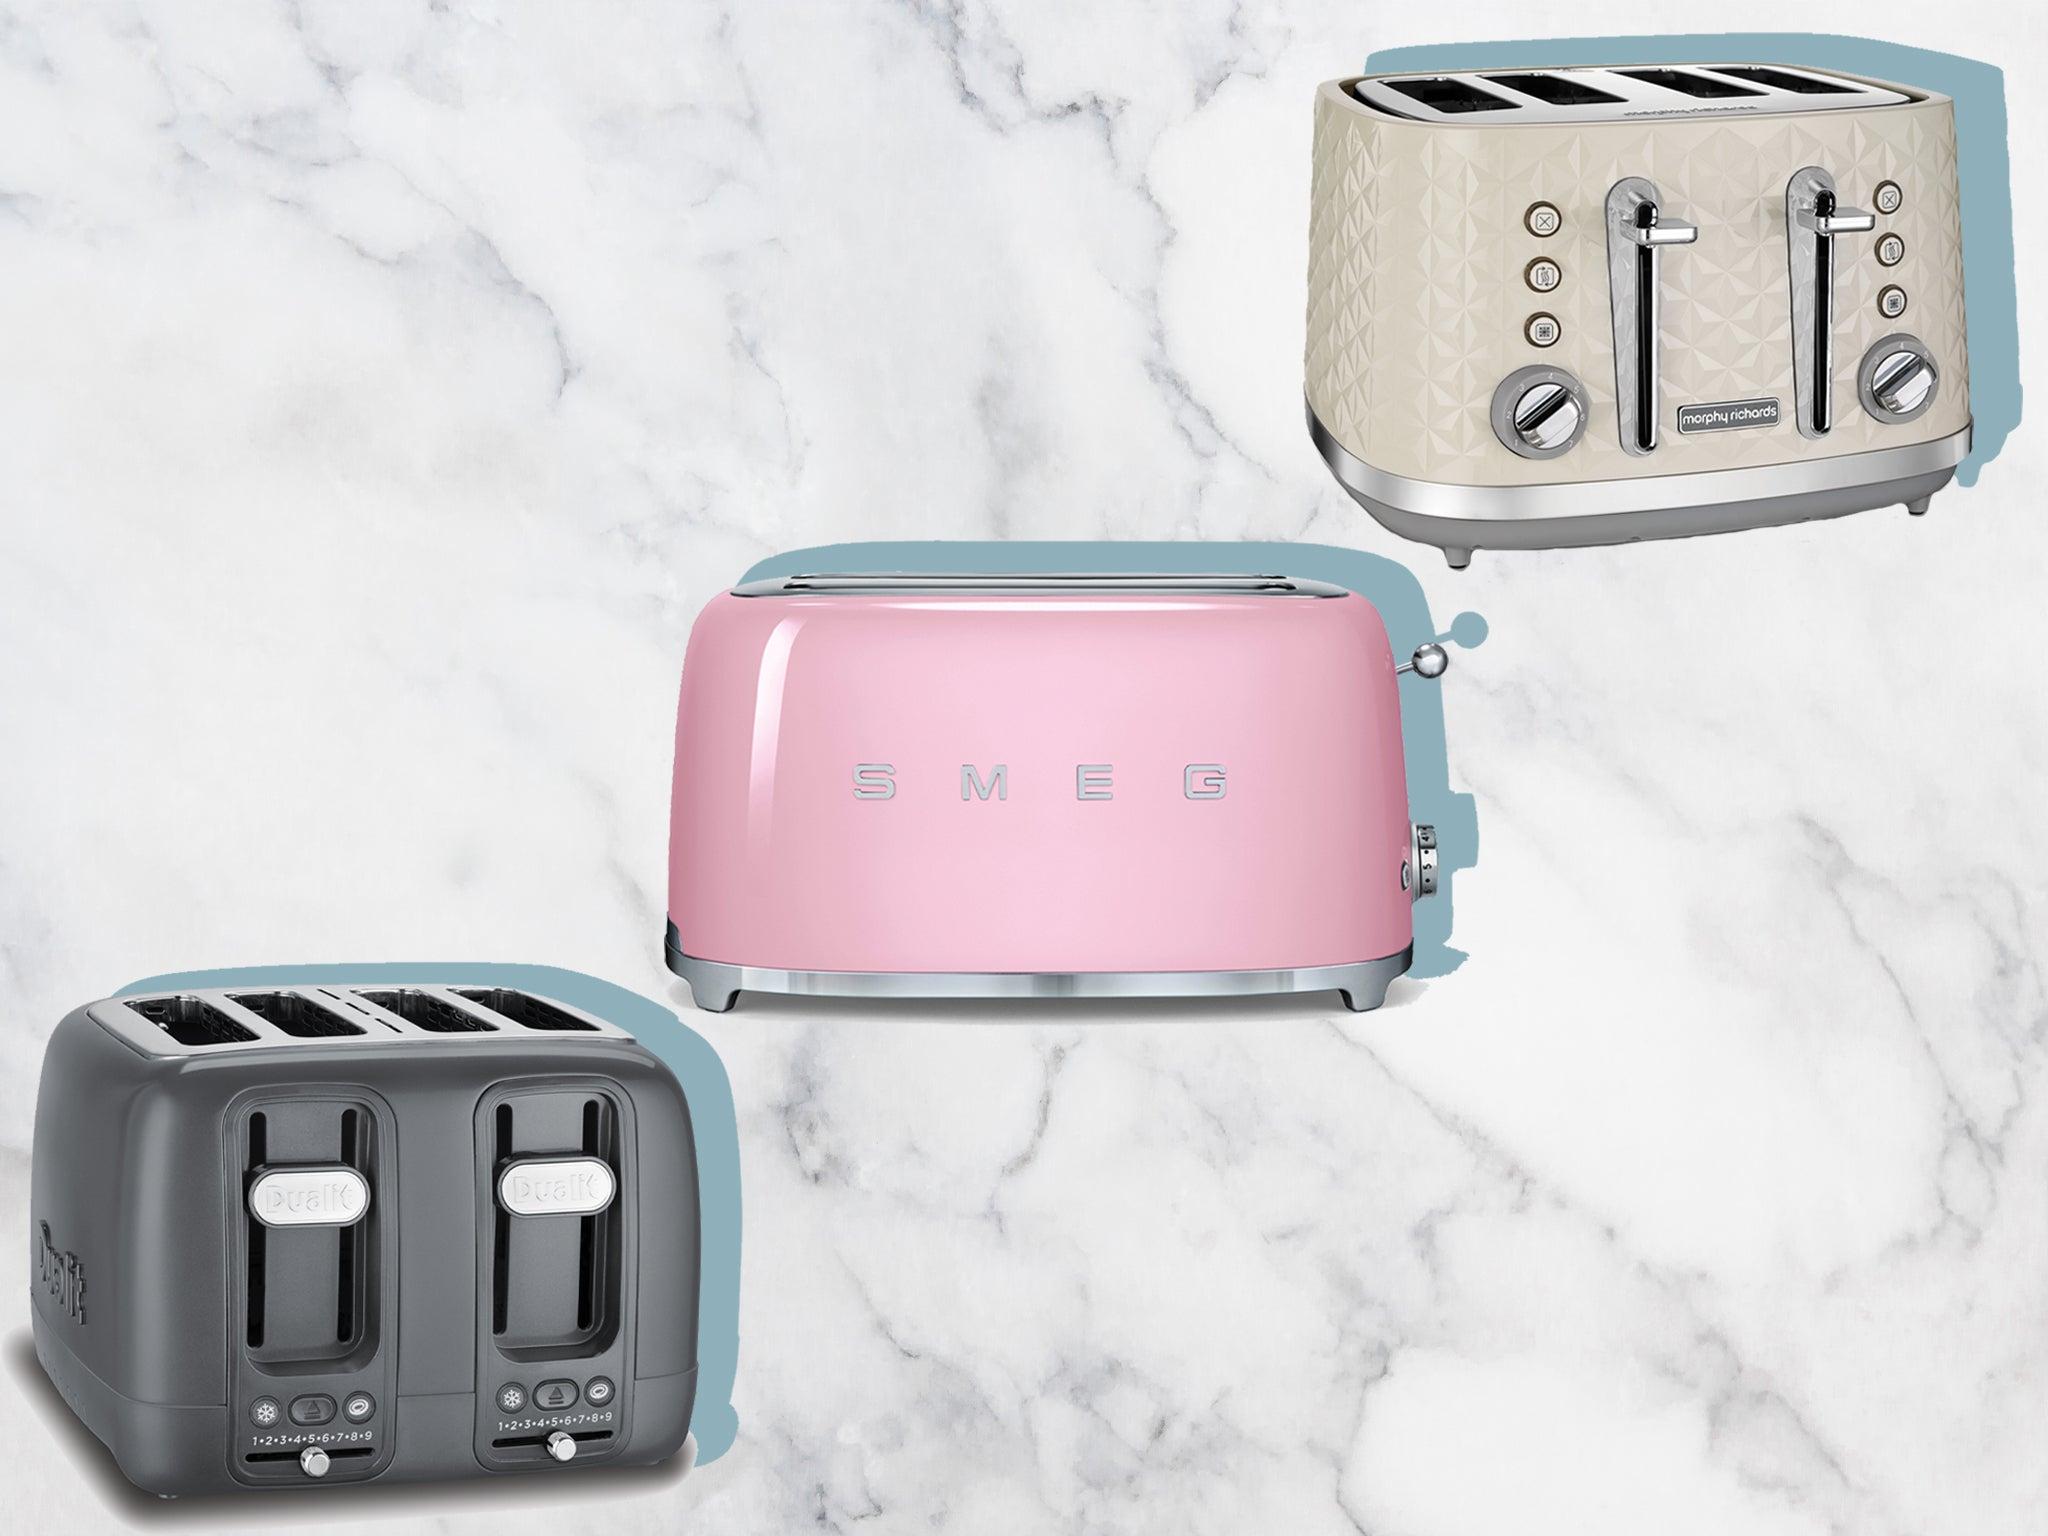 The 5 Best Slim Toasters to Buy in 2019 Cooking Indoor